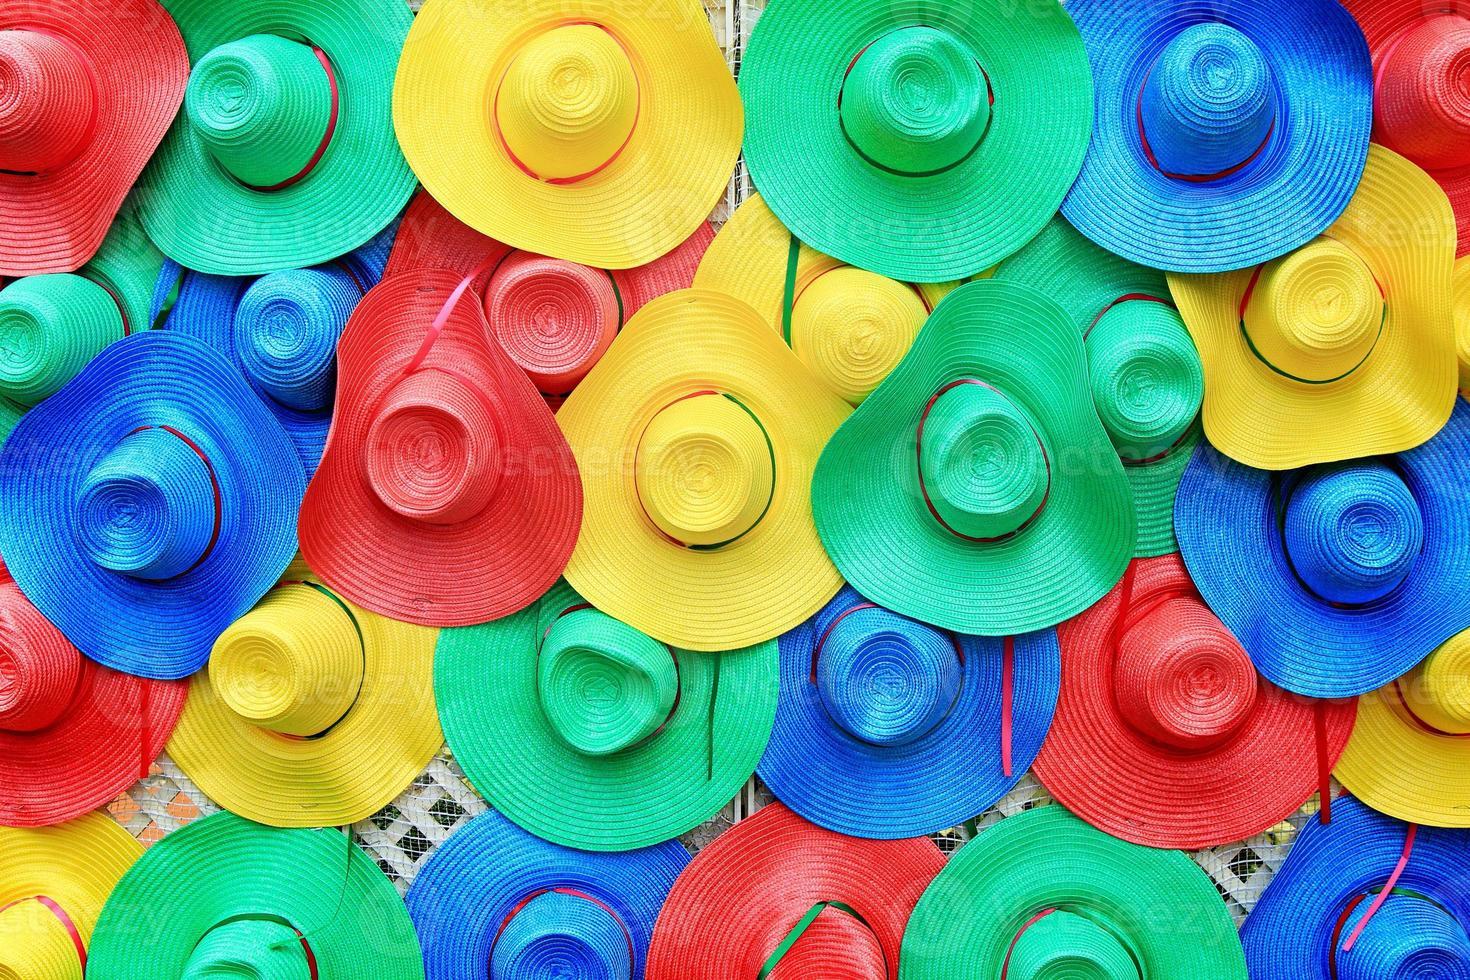 chapéus coloridos foto